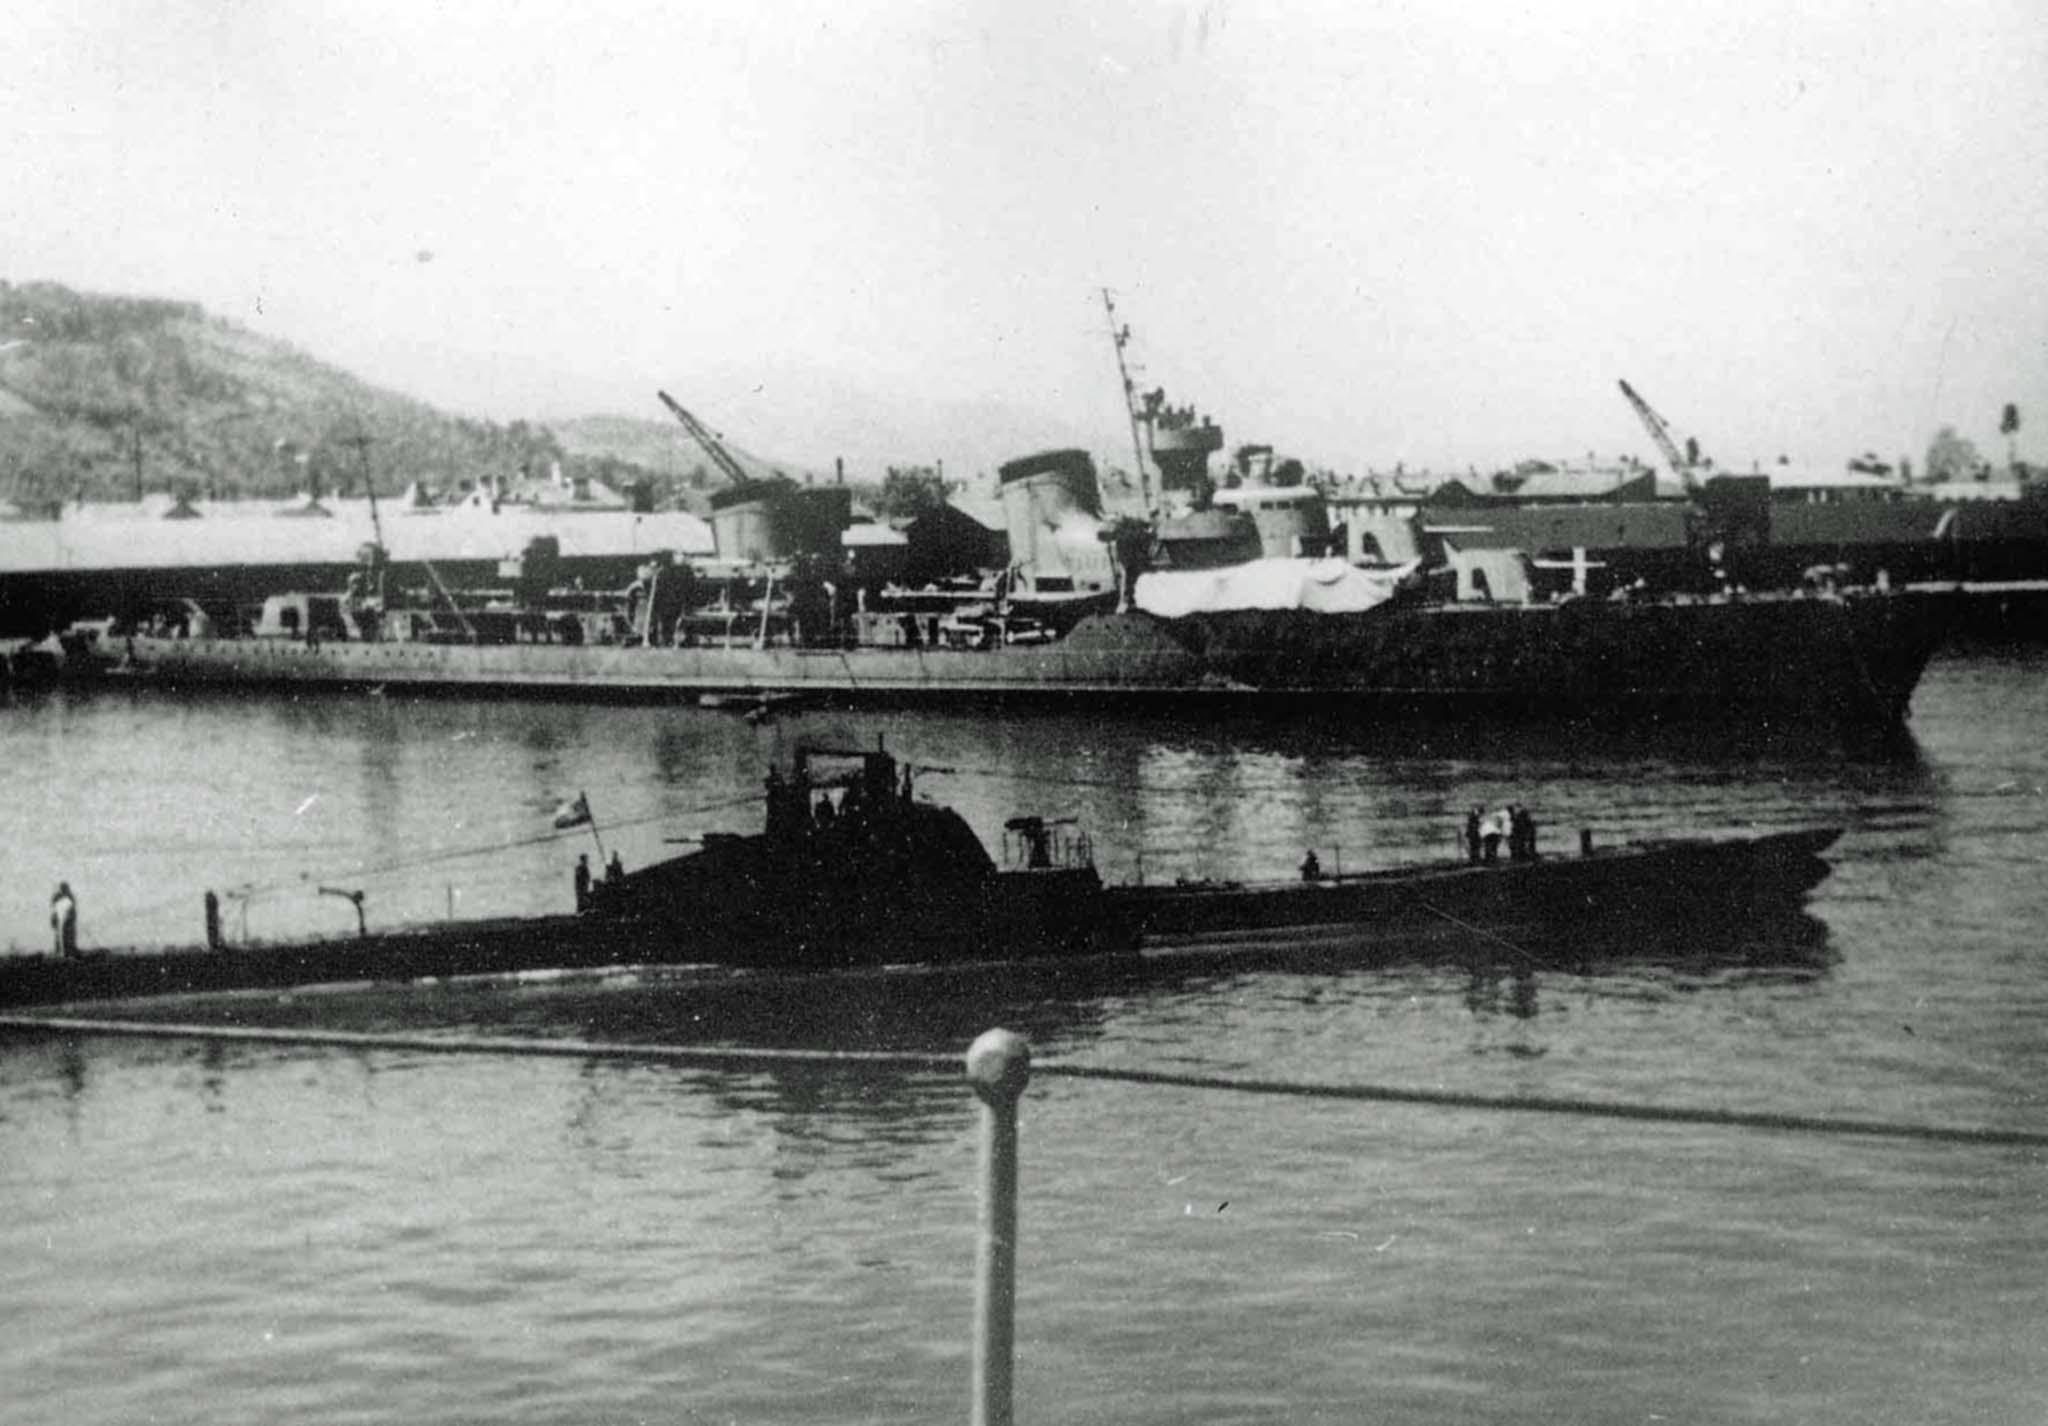 Submarine SHCH-212